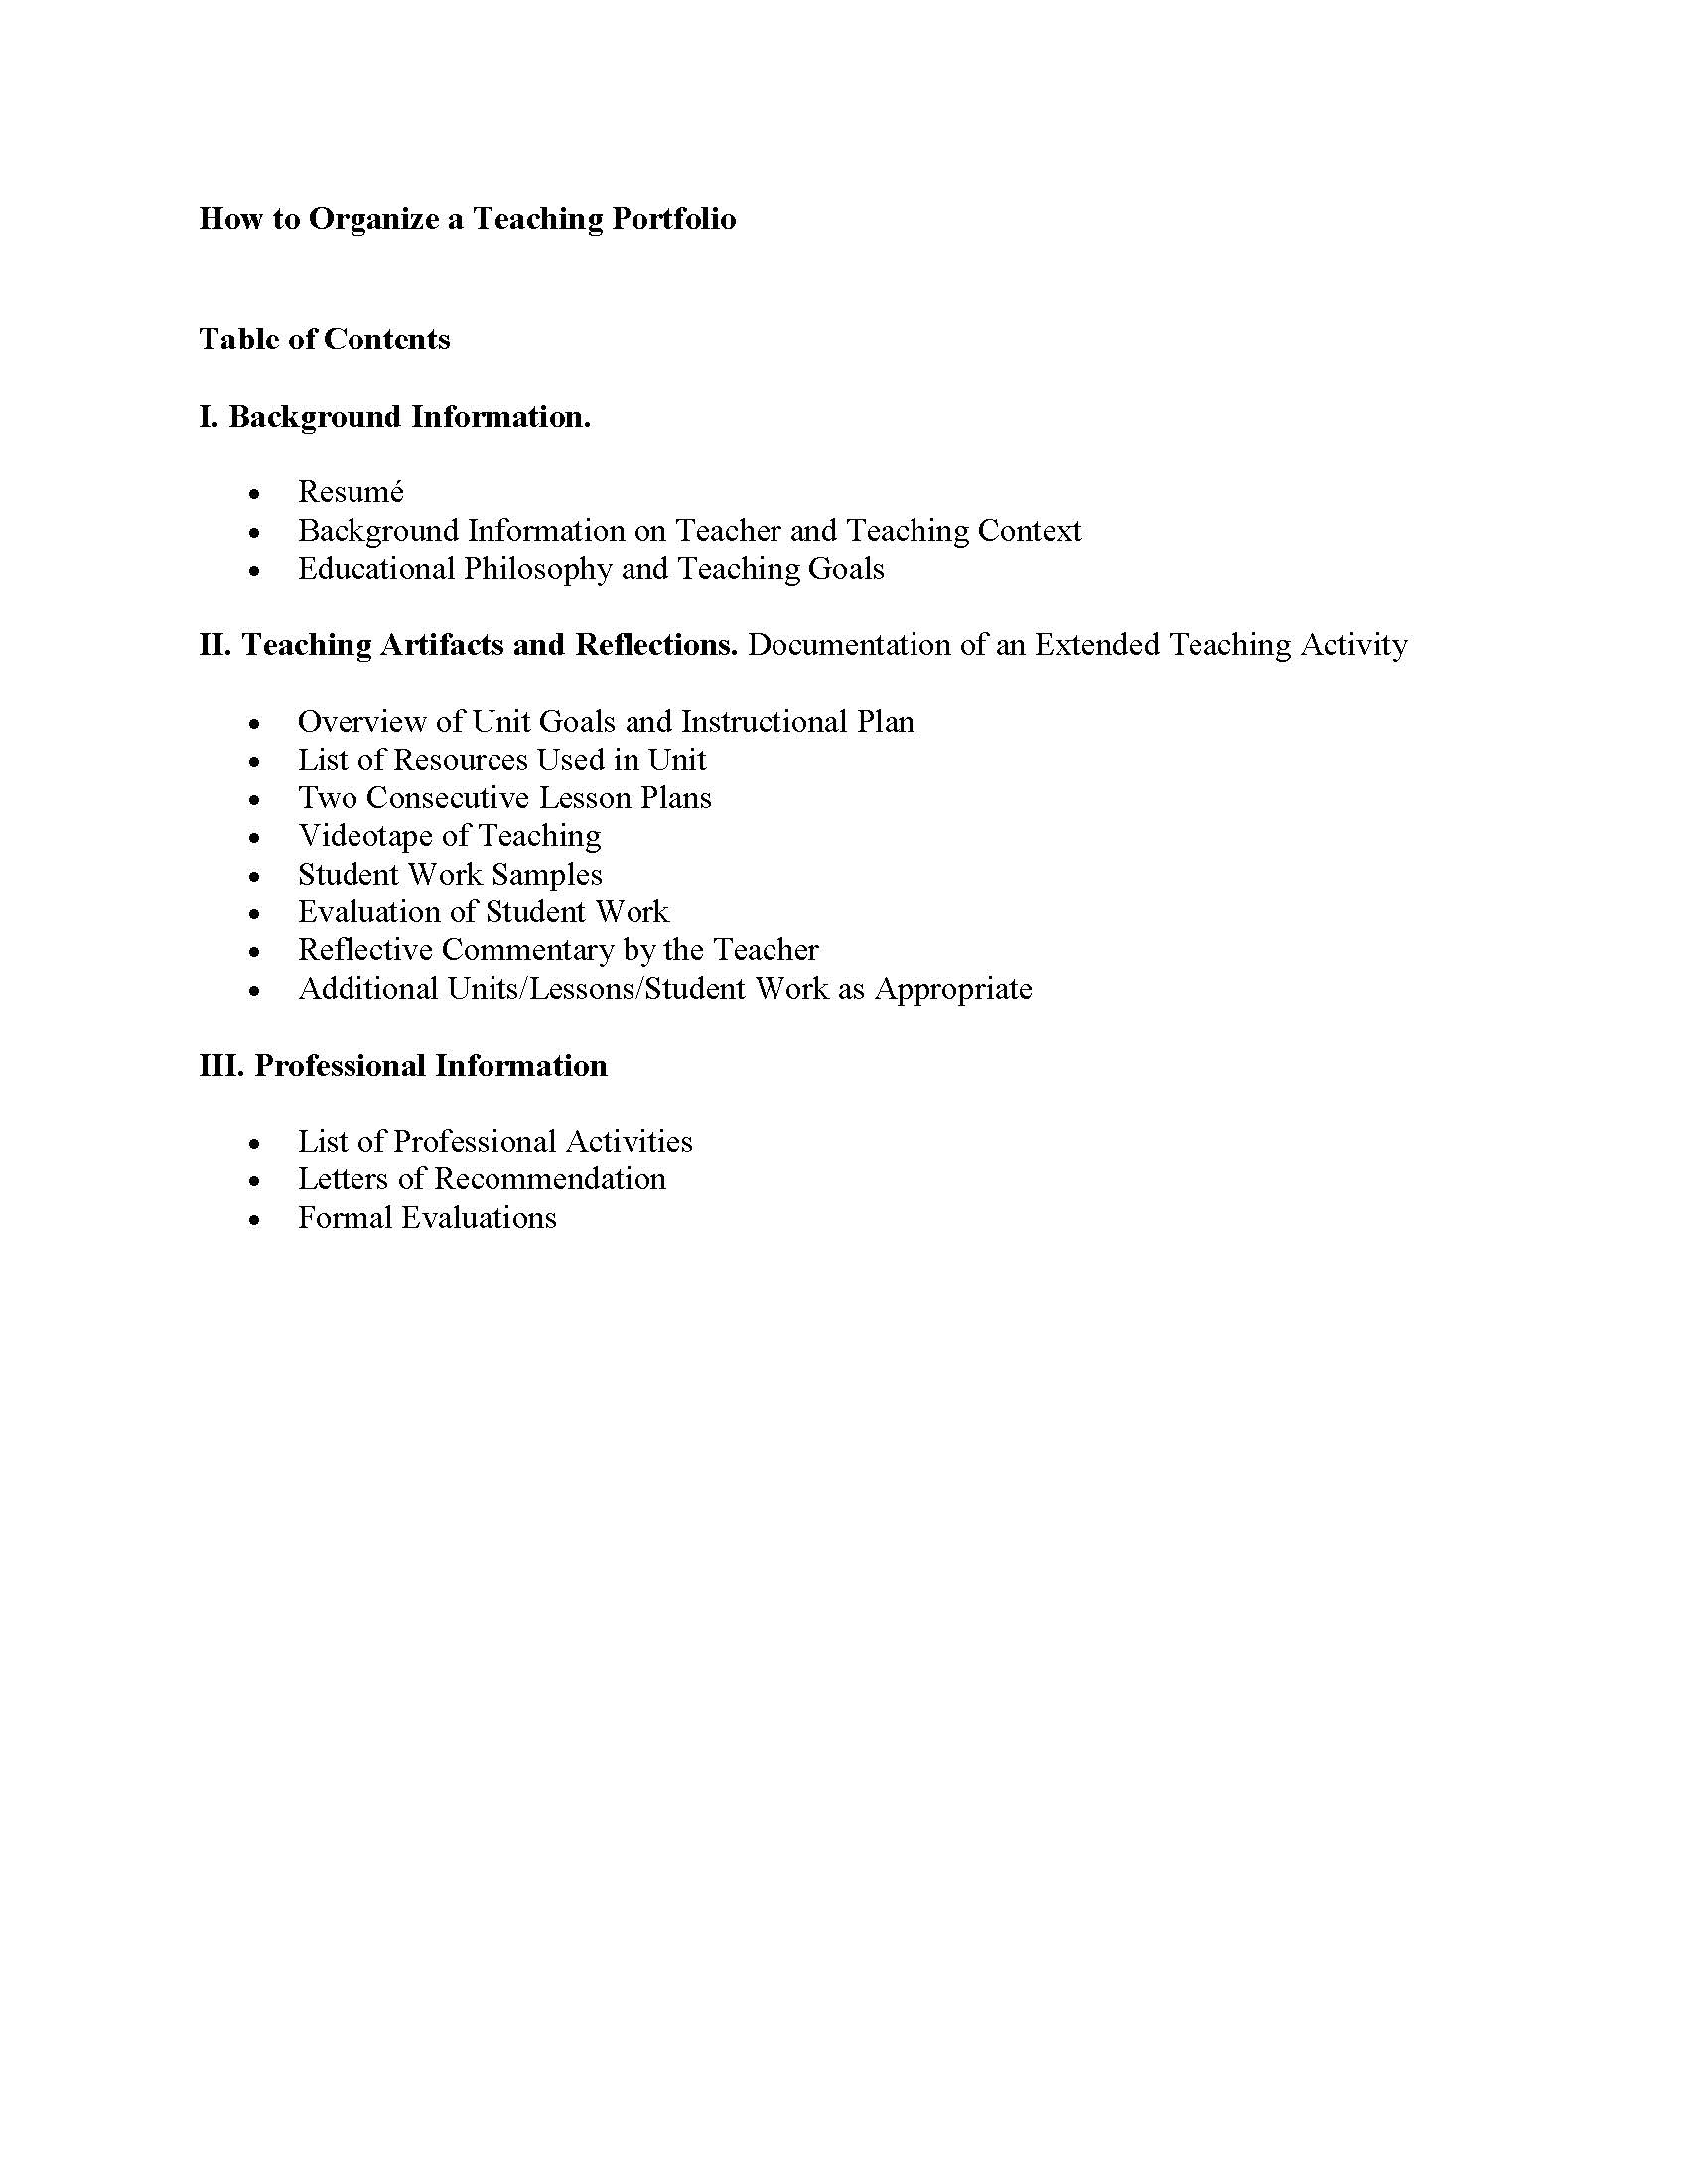 SW-16-QESS-Writing up Teaching PortfolioHow to Organize a